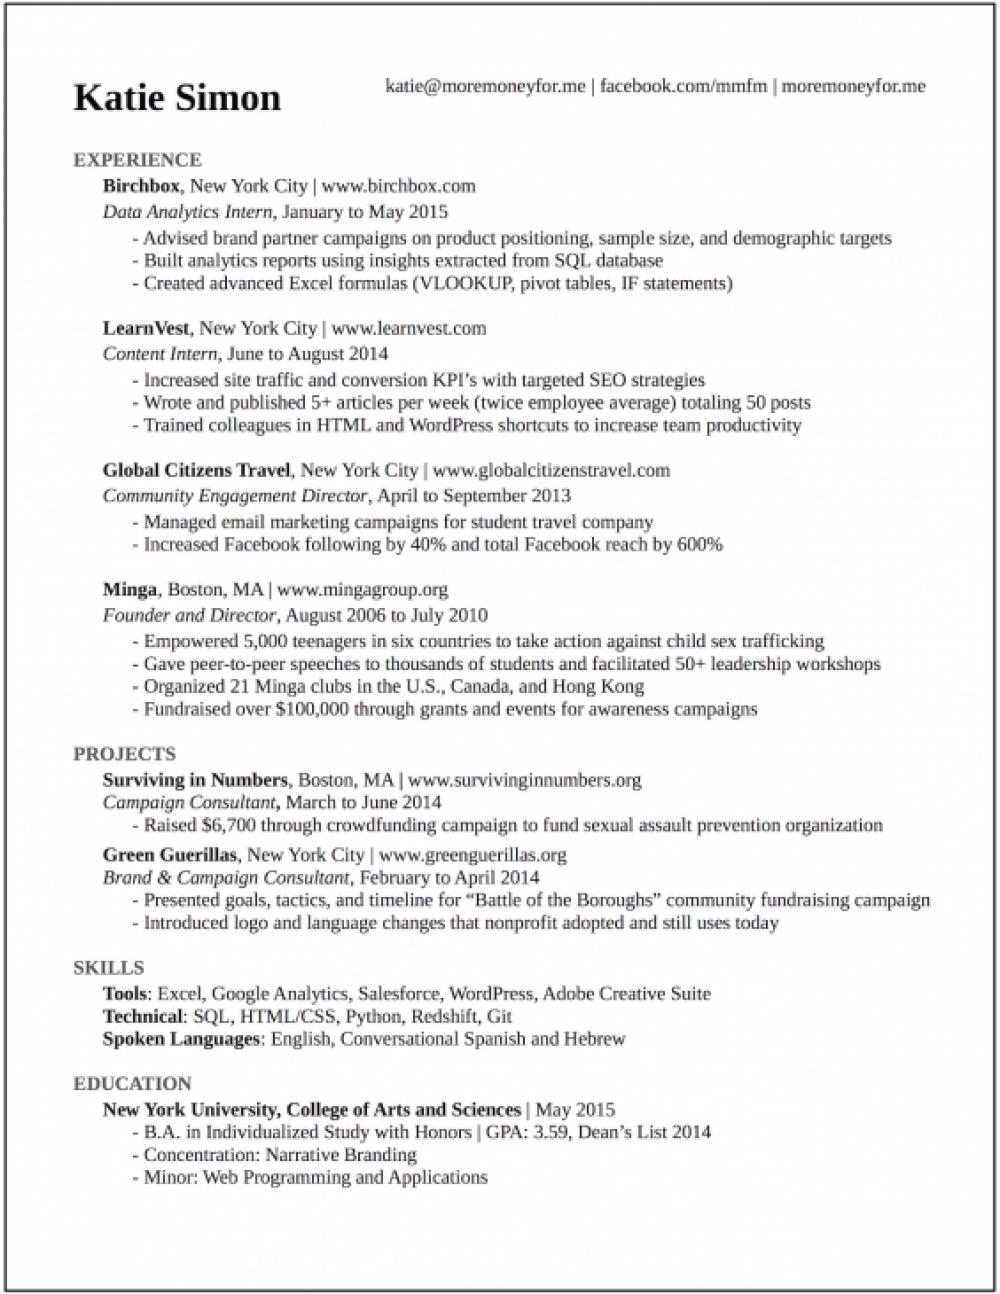 CV de Katie Simon | otros | Pinterest | El curriculum vitae ...